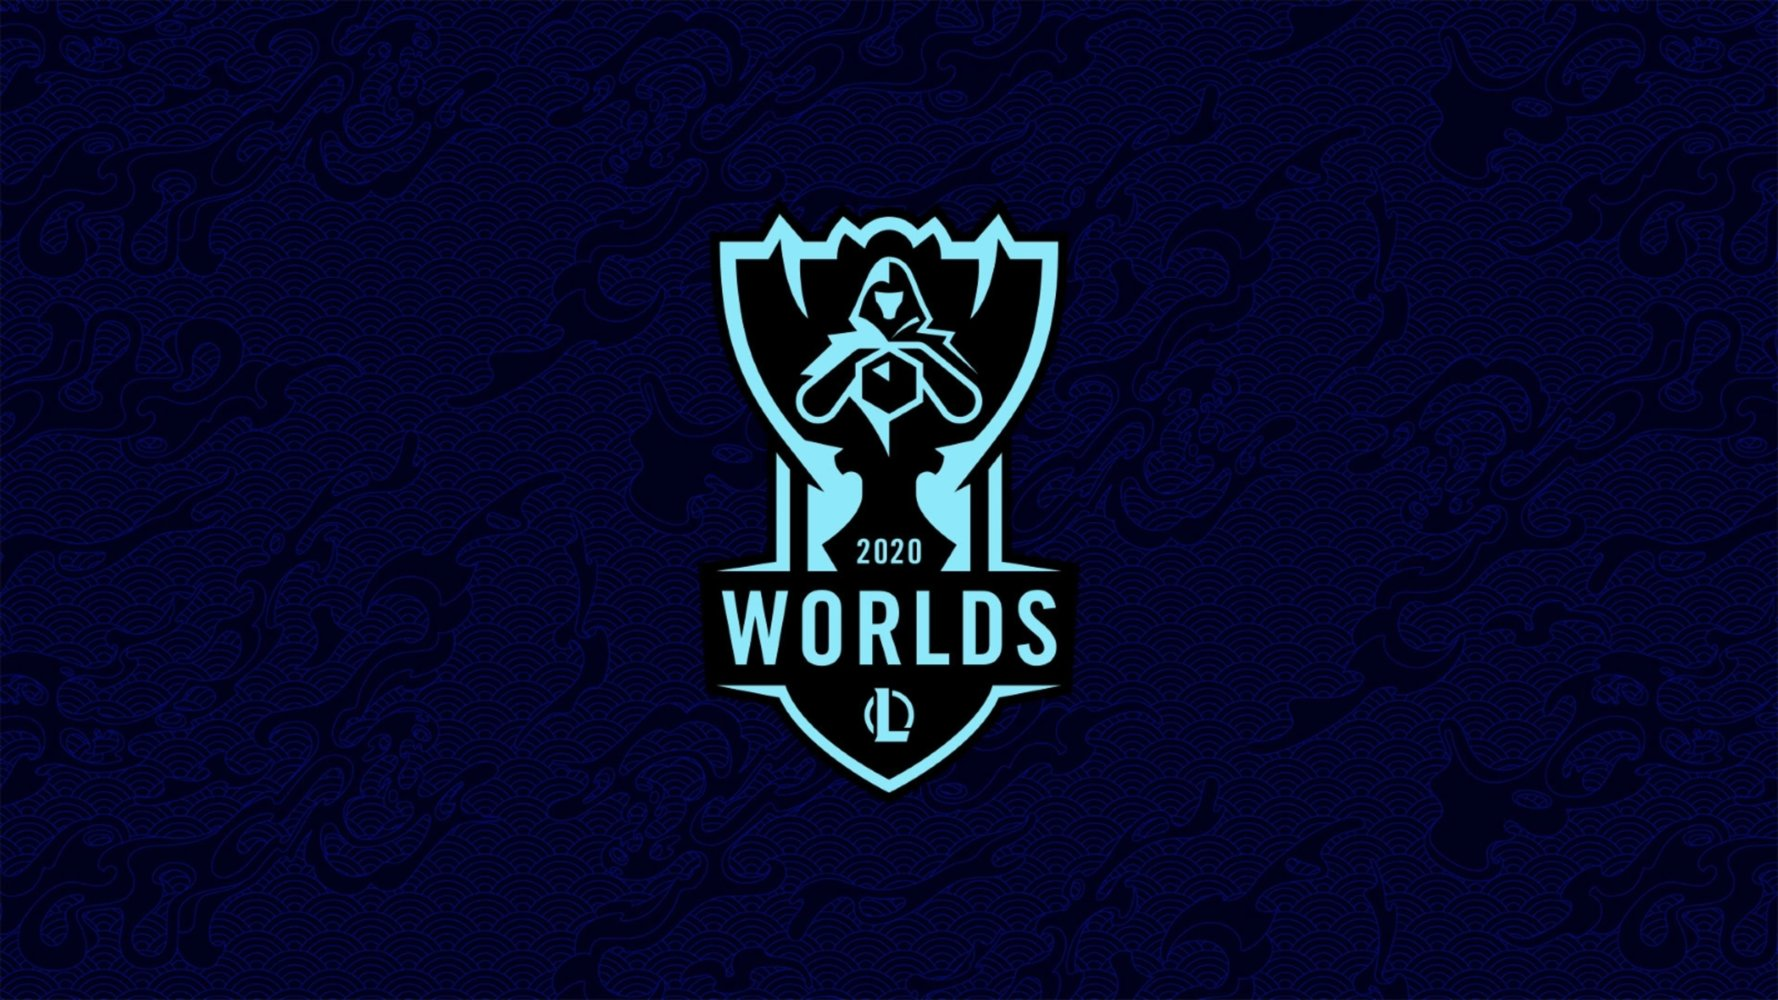 worlds 2020 league of legends